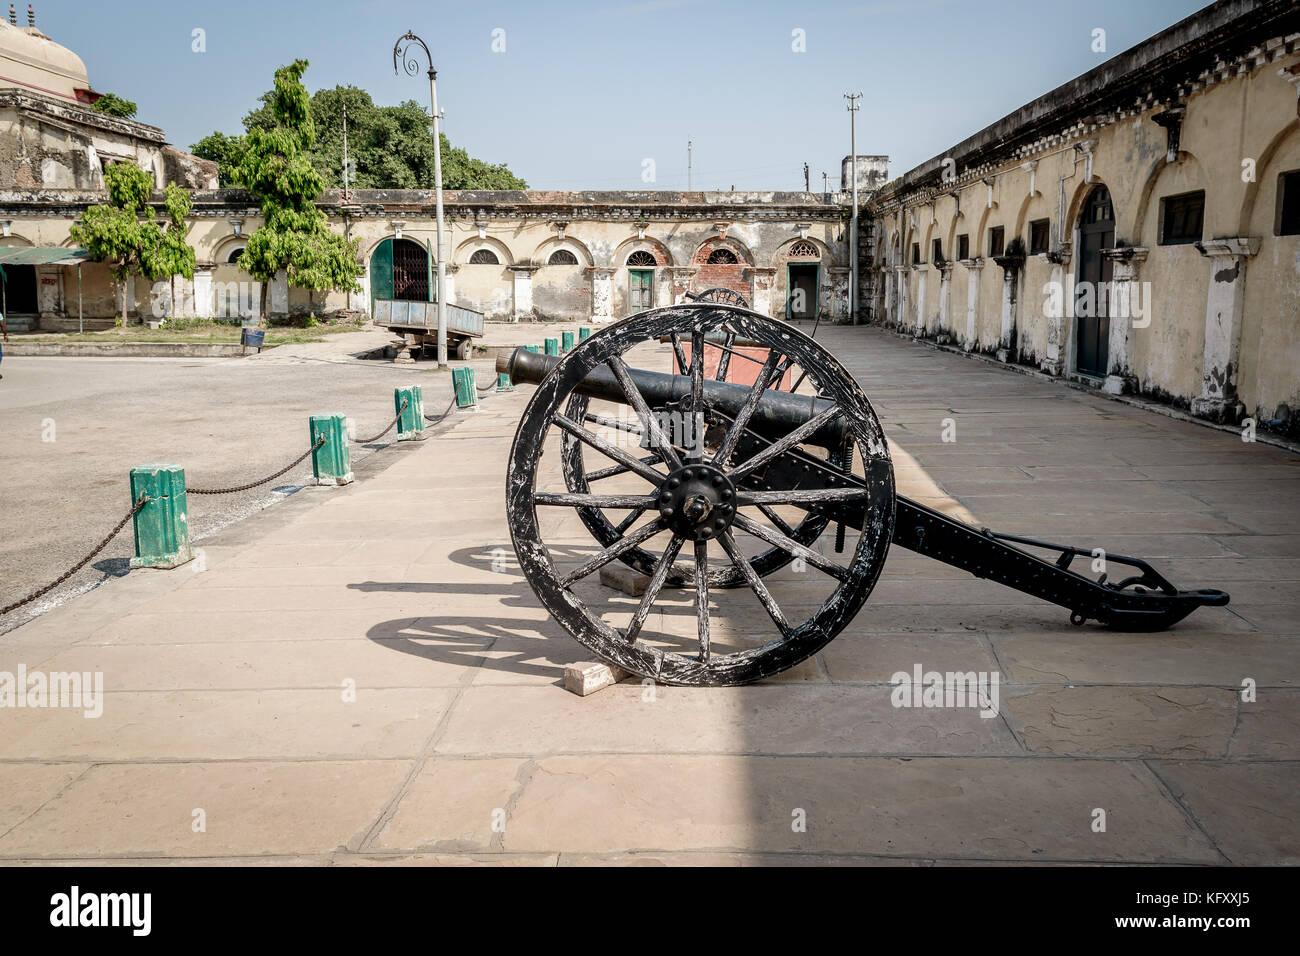 An Ancient canon on the courtyard at Ramnagar Fort, Varanasi India. - Stock Image